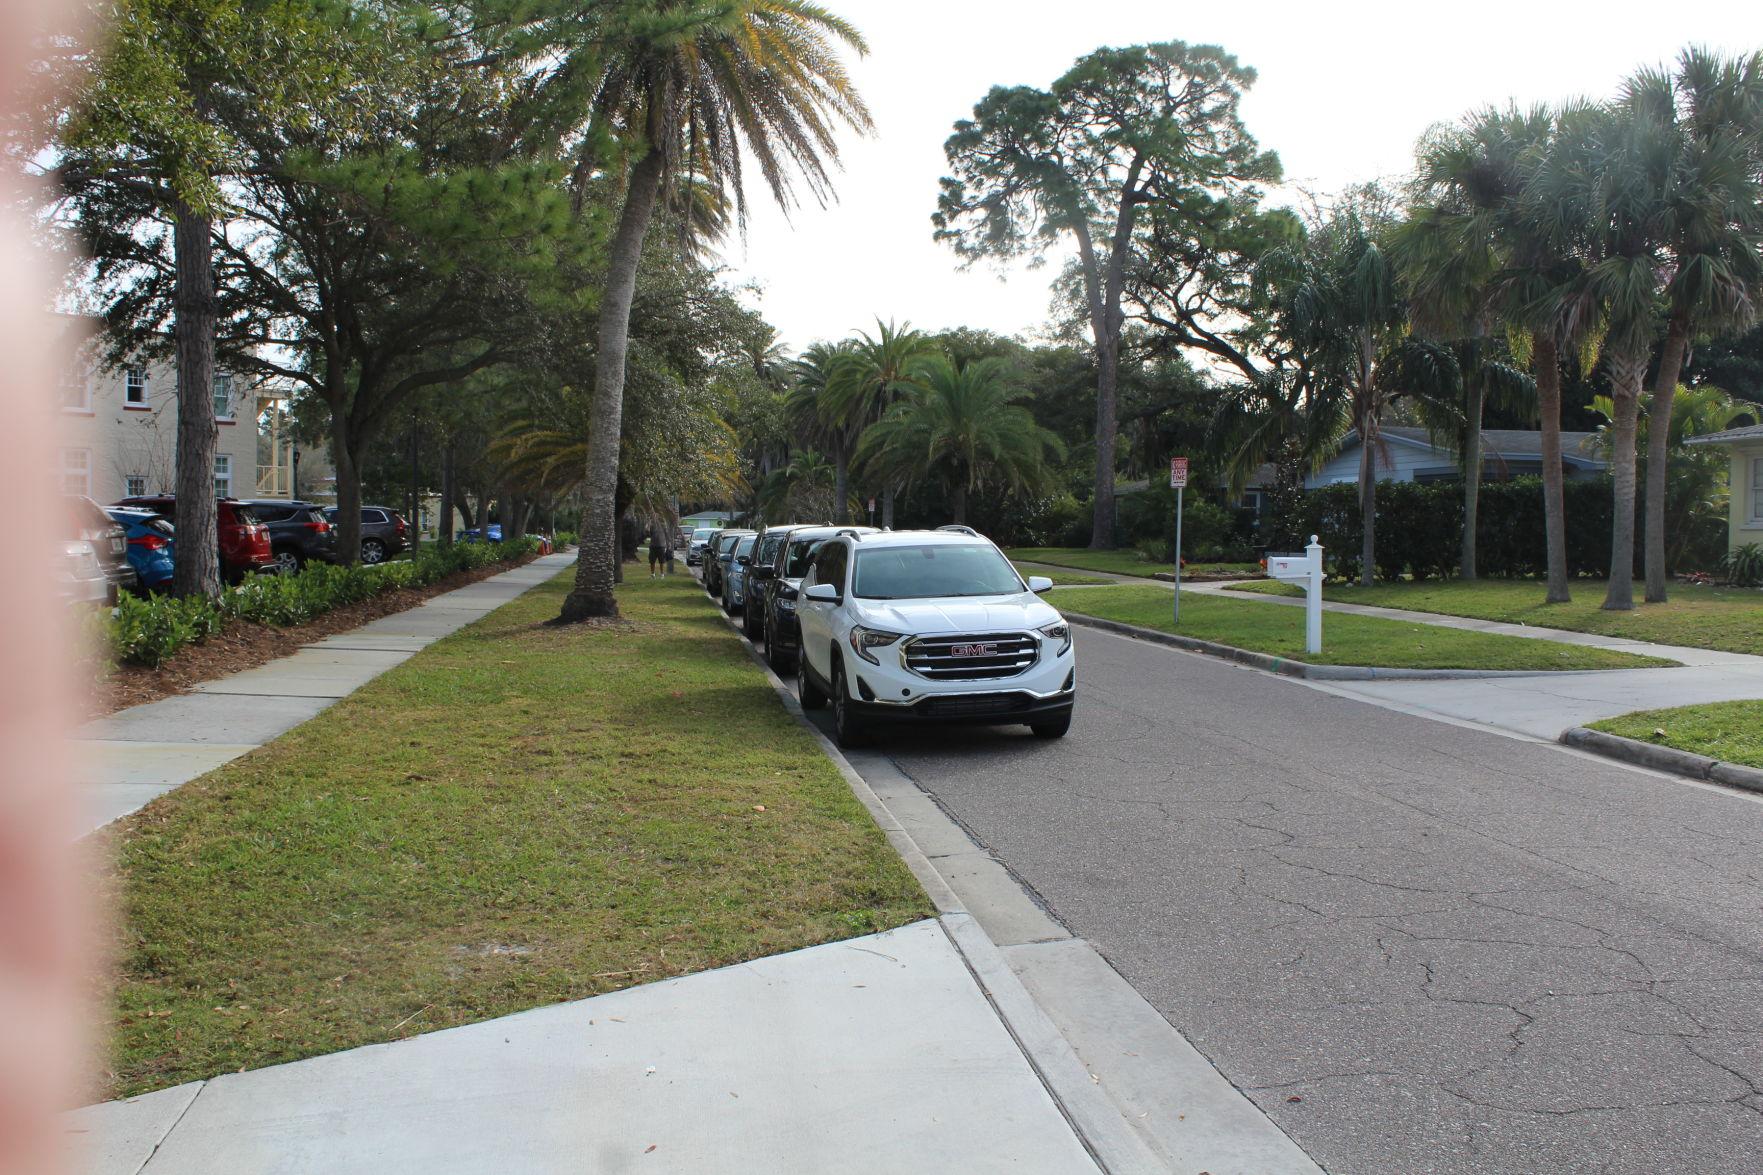 Fenway parking